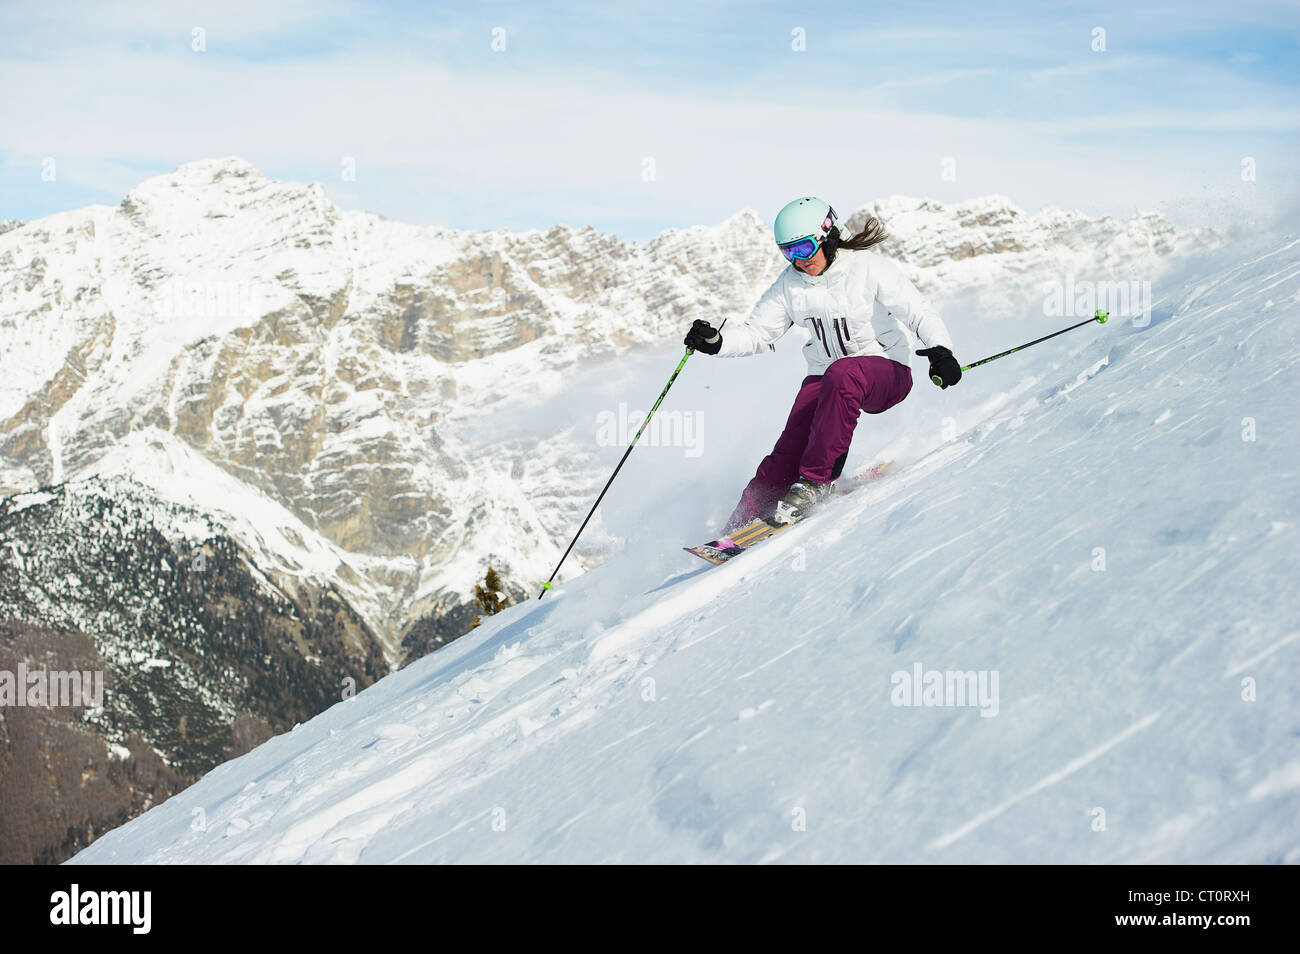 Skier skiing on snowy slope - Stock Image